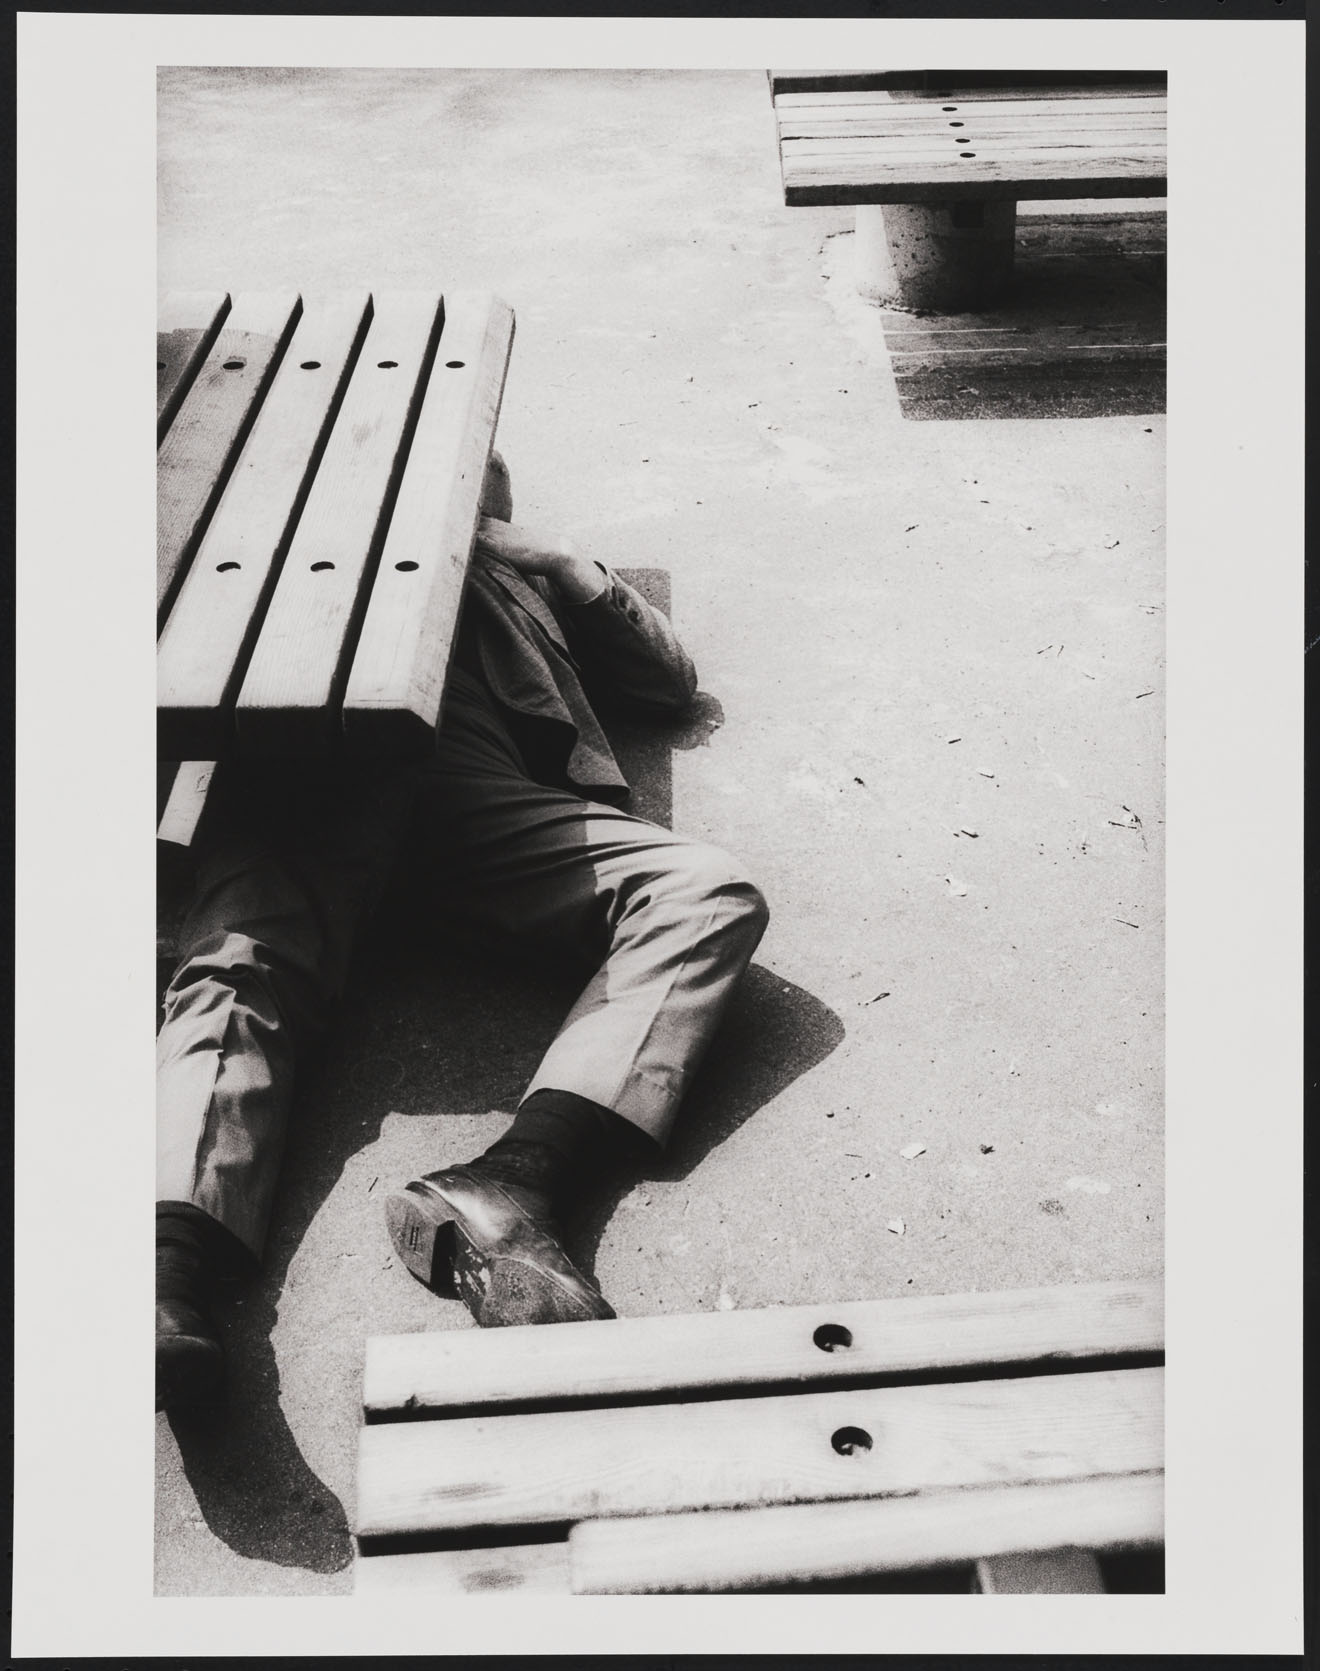 Leland Bobbé, Chelsea, 1976